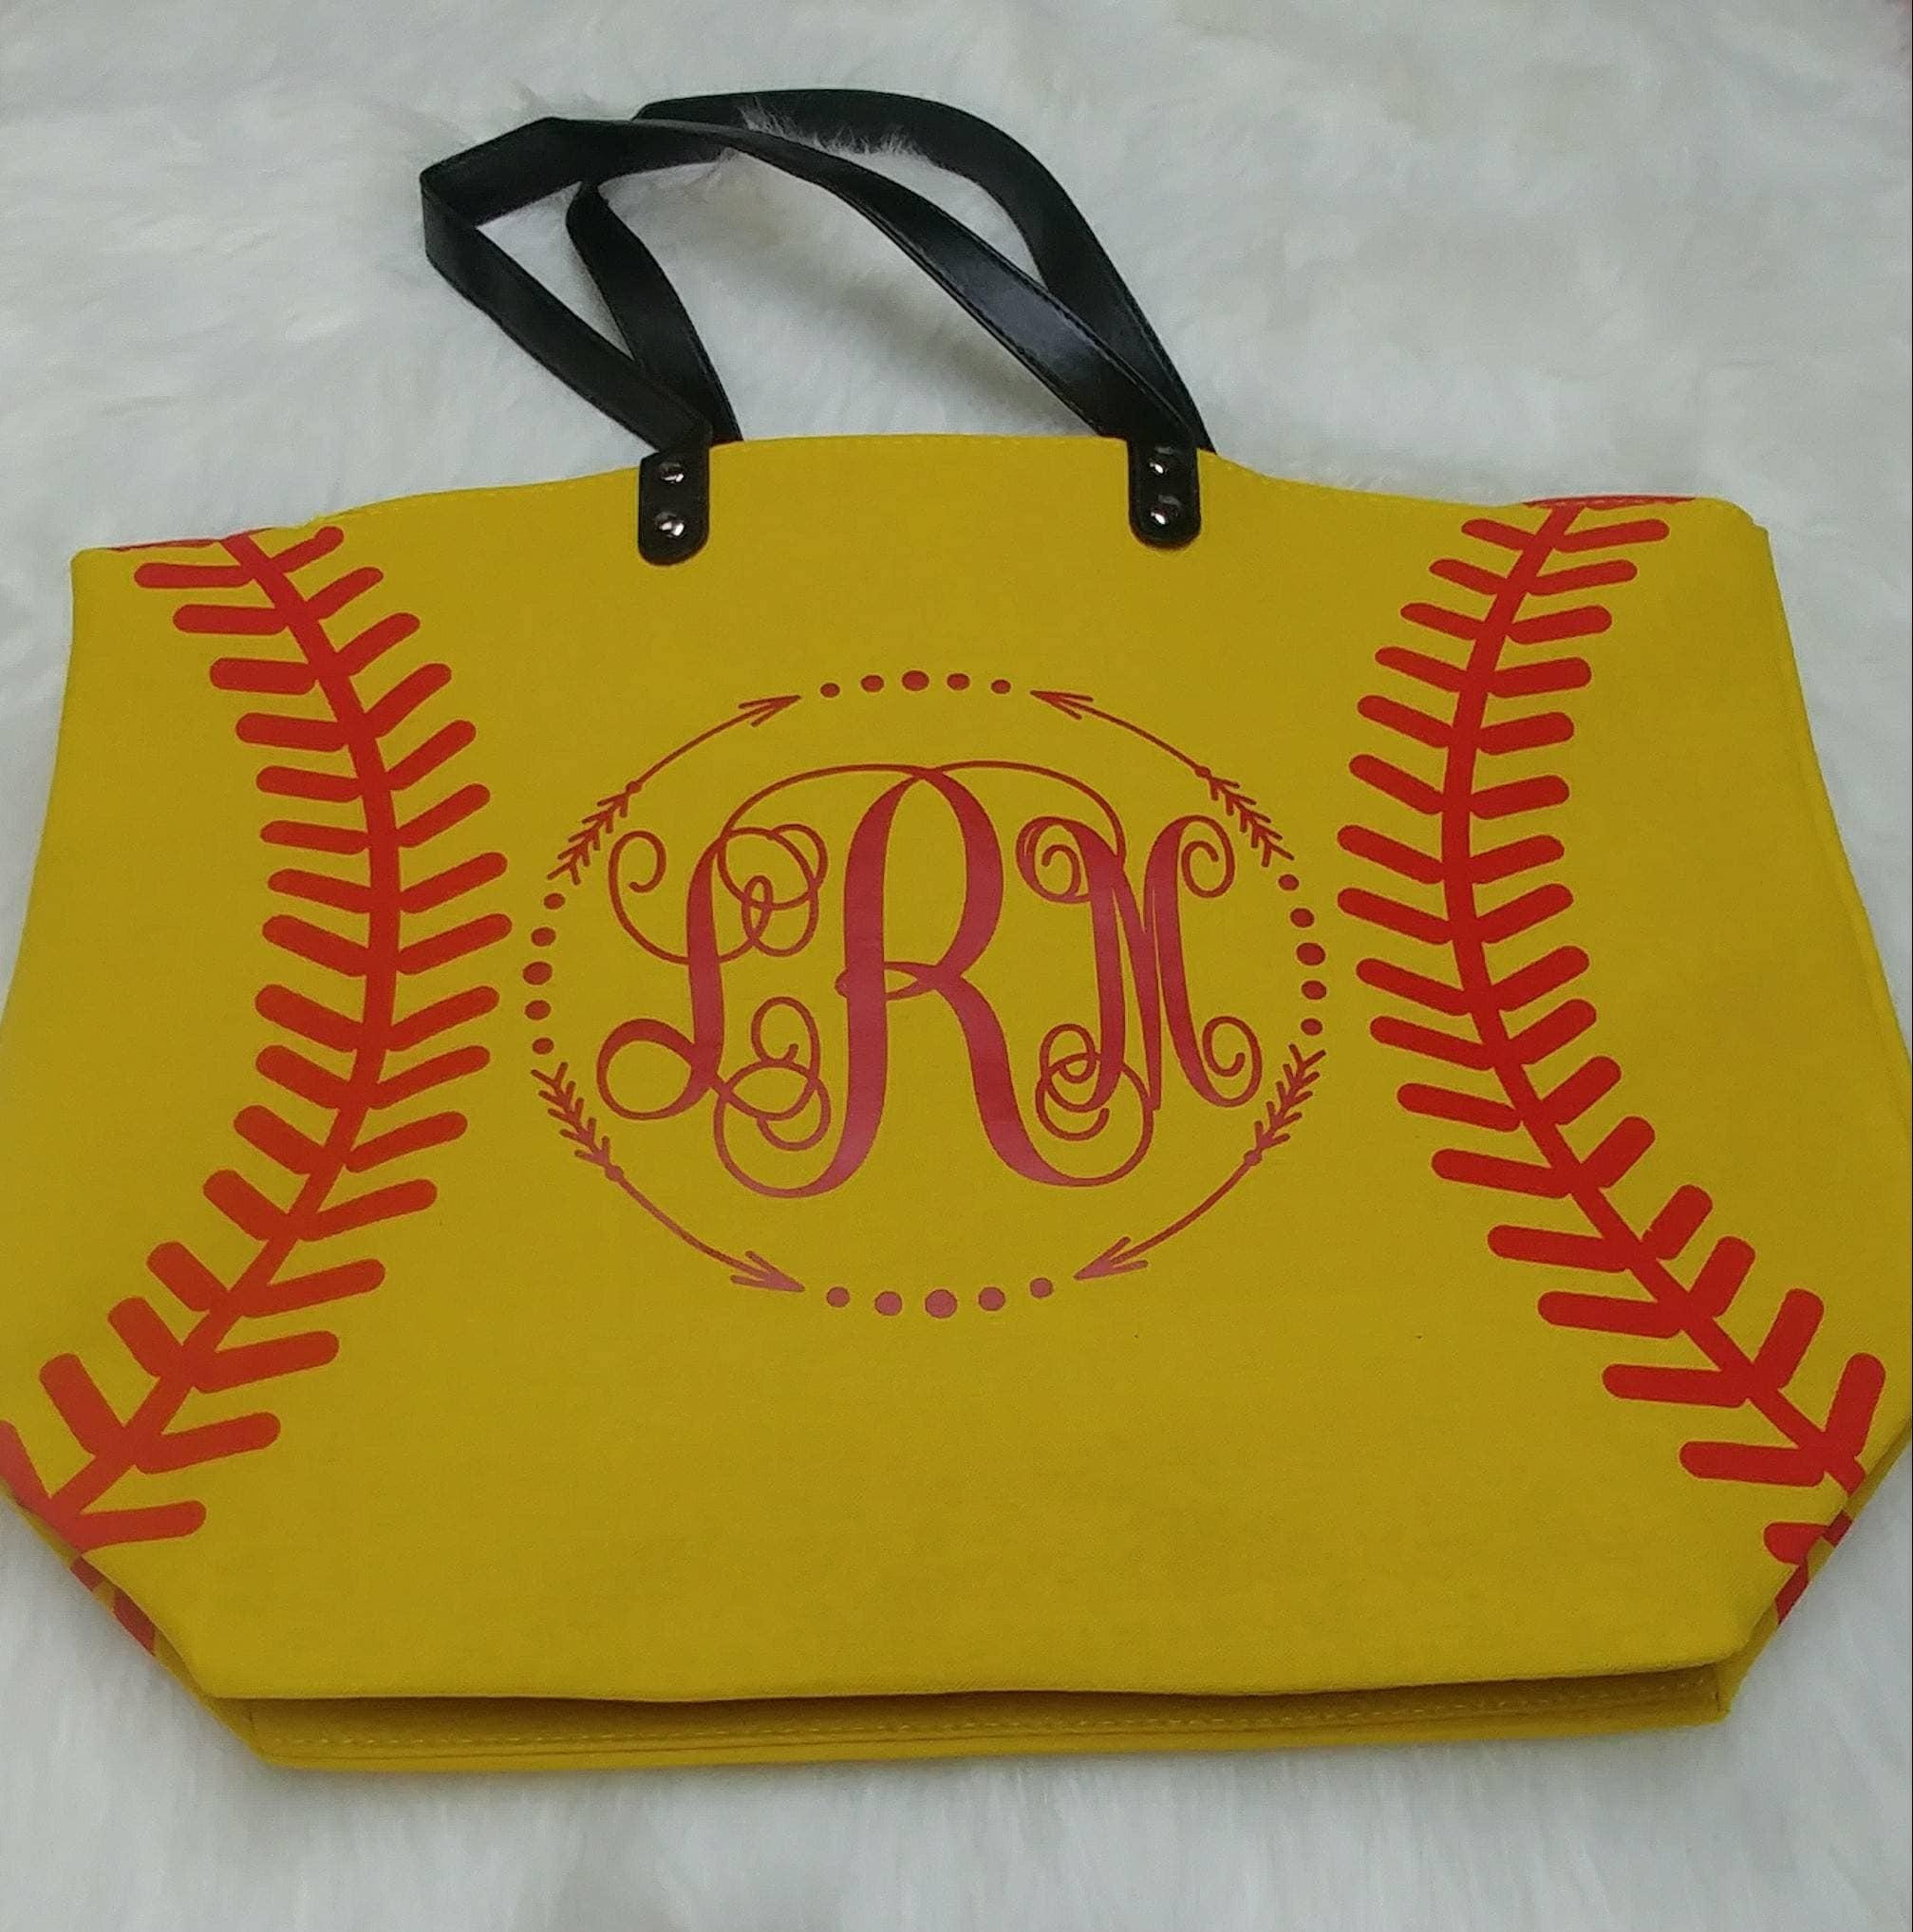 c0f3376ab8fc Softball bag/ Baseball Bag/ Purse/ Tote/ Yellow/ White/ Red/ Monogram/  Name/ Woman/ Girls/ Bag/ Baseball/ Softball/ personalized